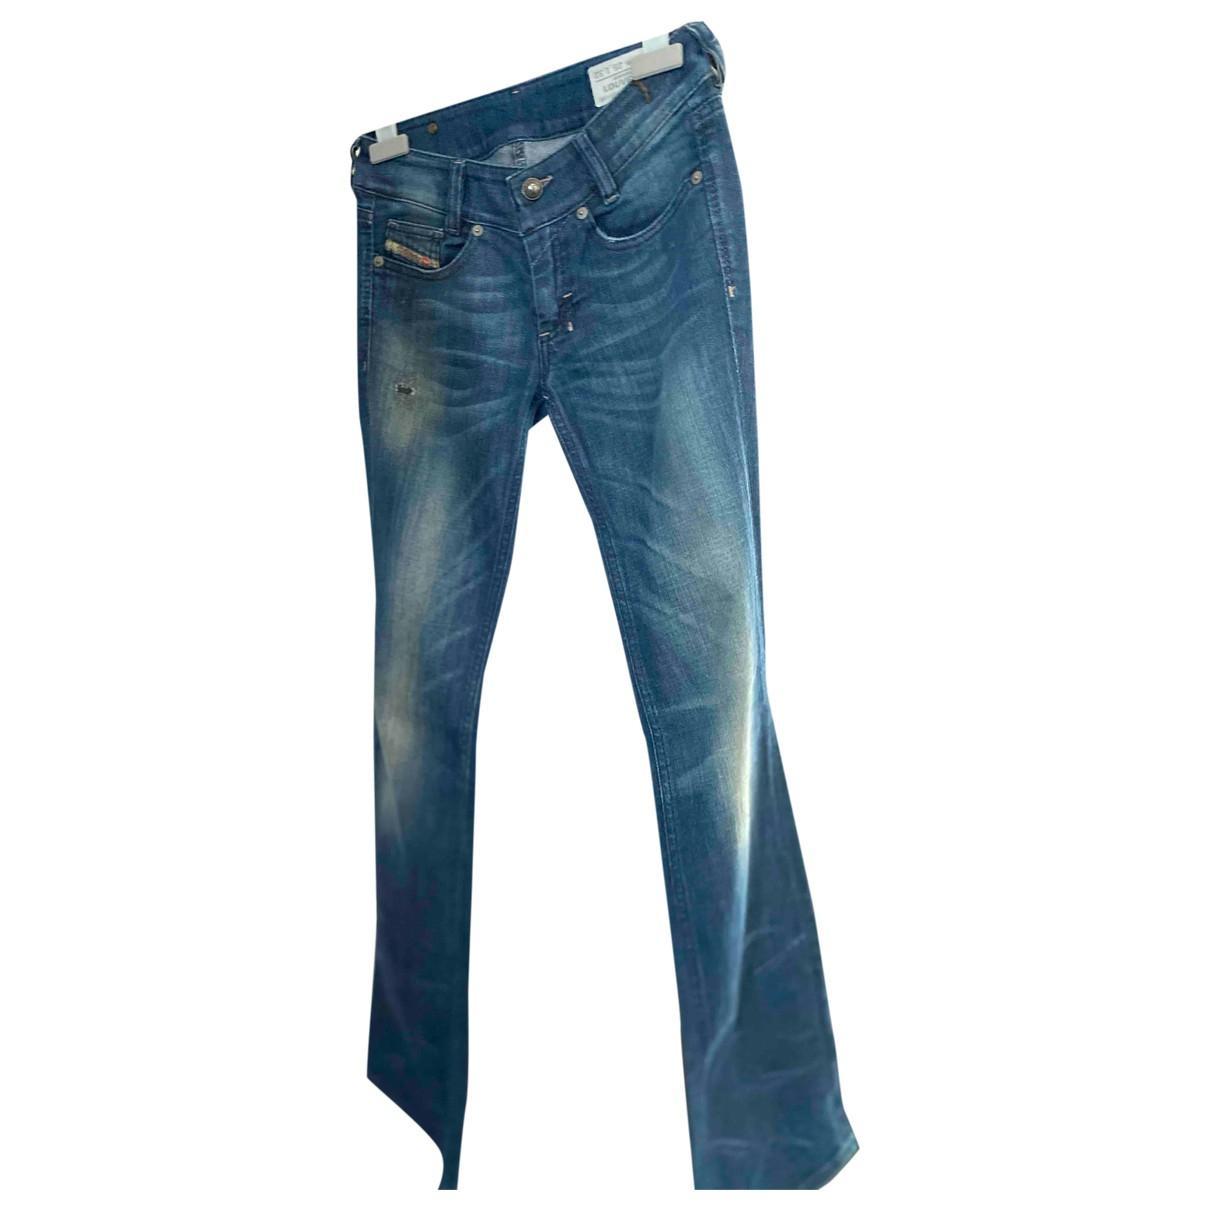 Diesel \N Blue Cotton - elasthane Jeans for Women 25 US